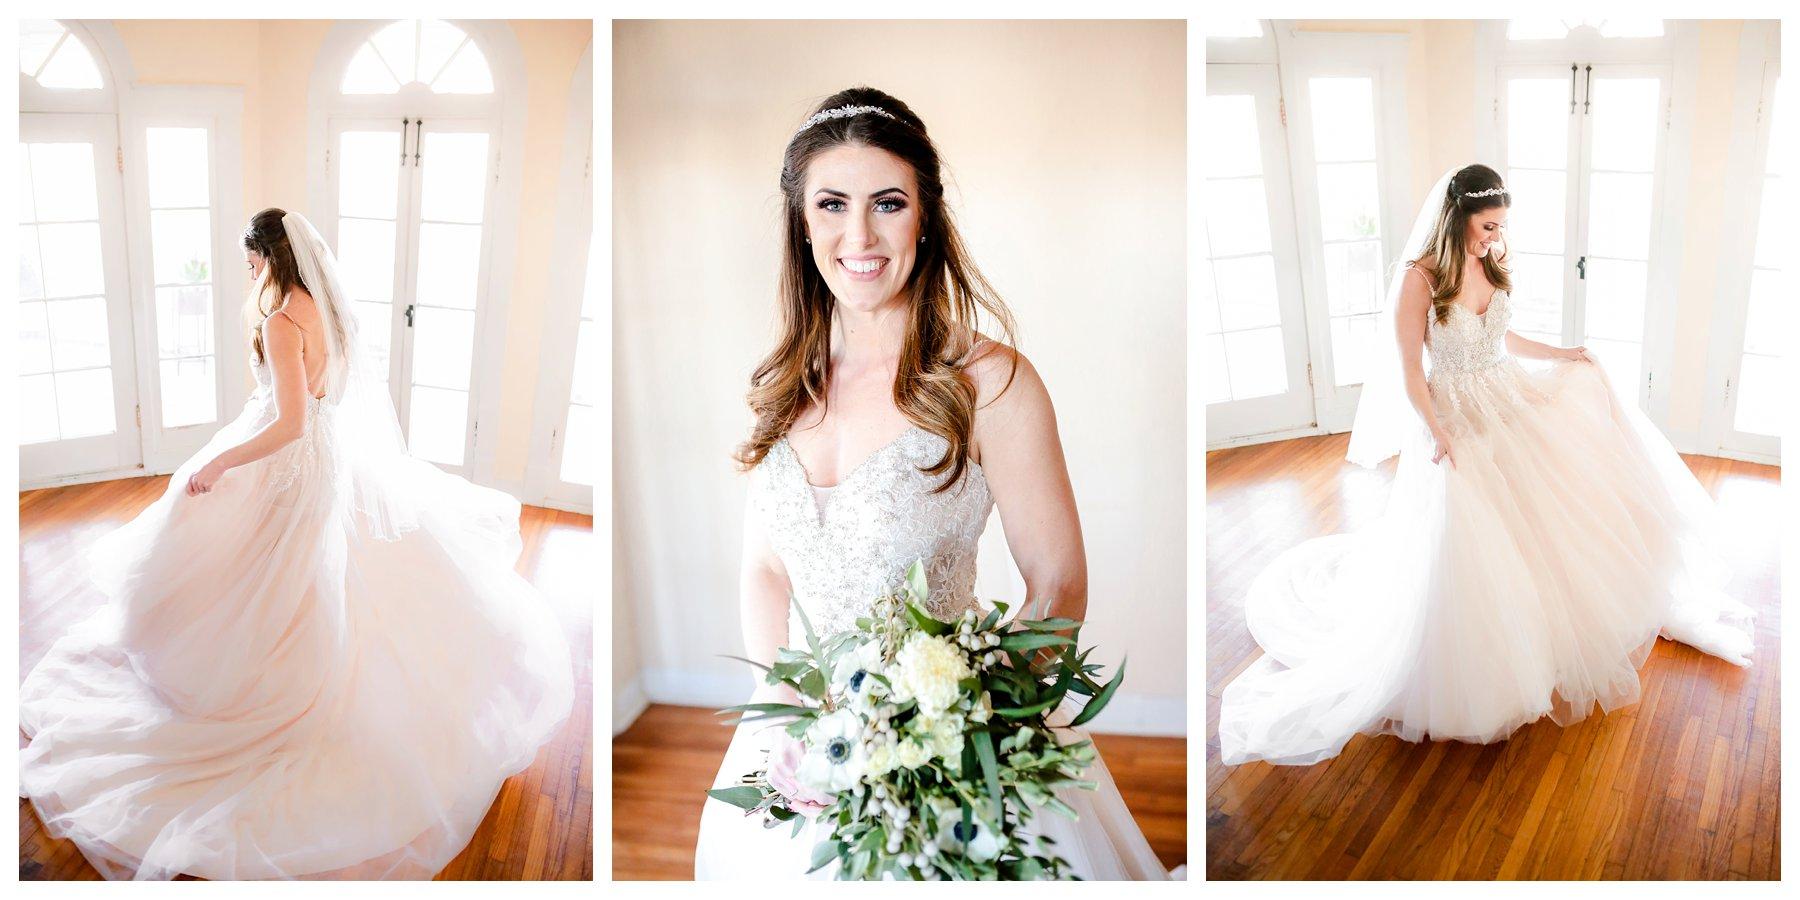 photographer_wedding_saint_louis_Kansas_City_Photography_Videography_workshop_training_styled_engagement_Lake_Ozark_KC_MO_STL_Rolla_Hermann_Saint_James_0353.jpg